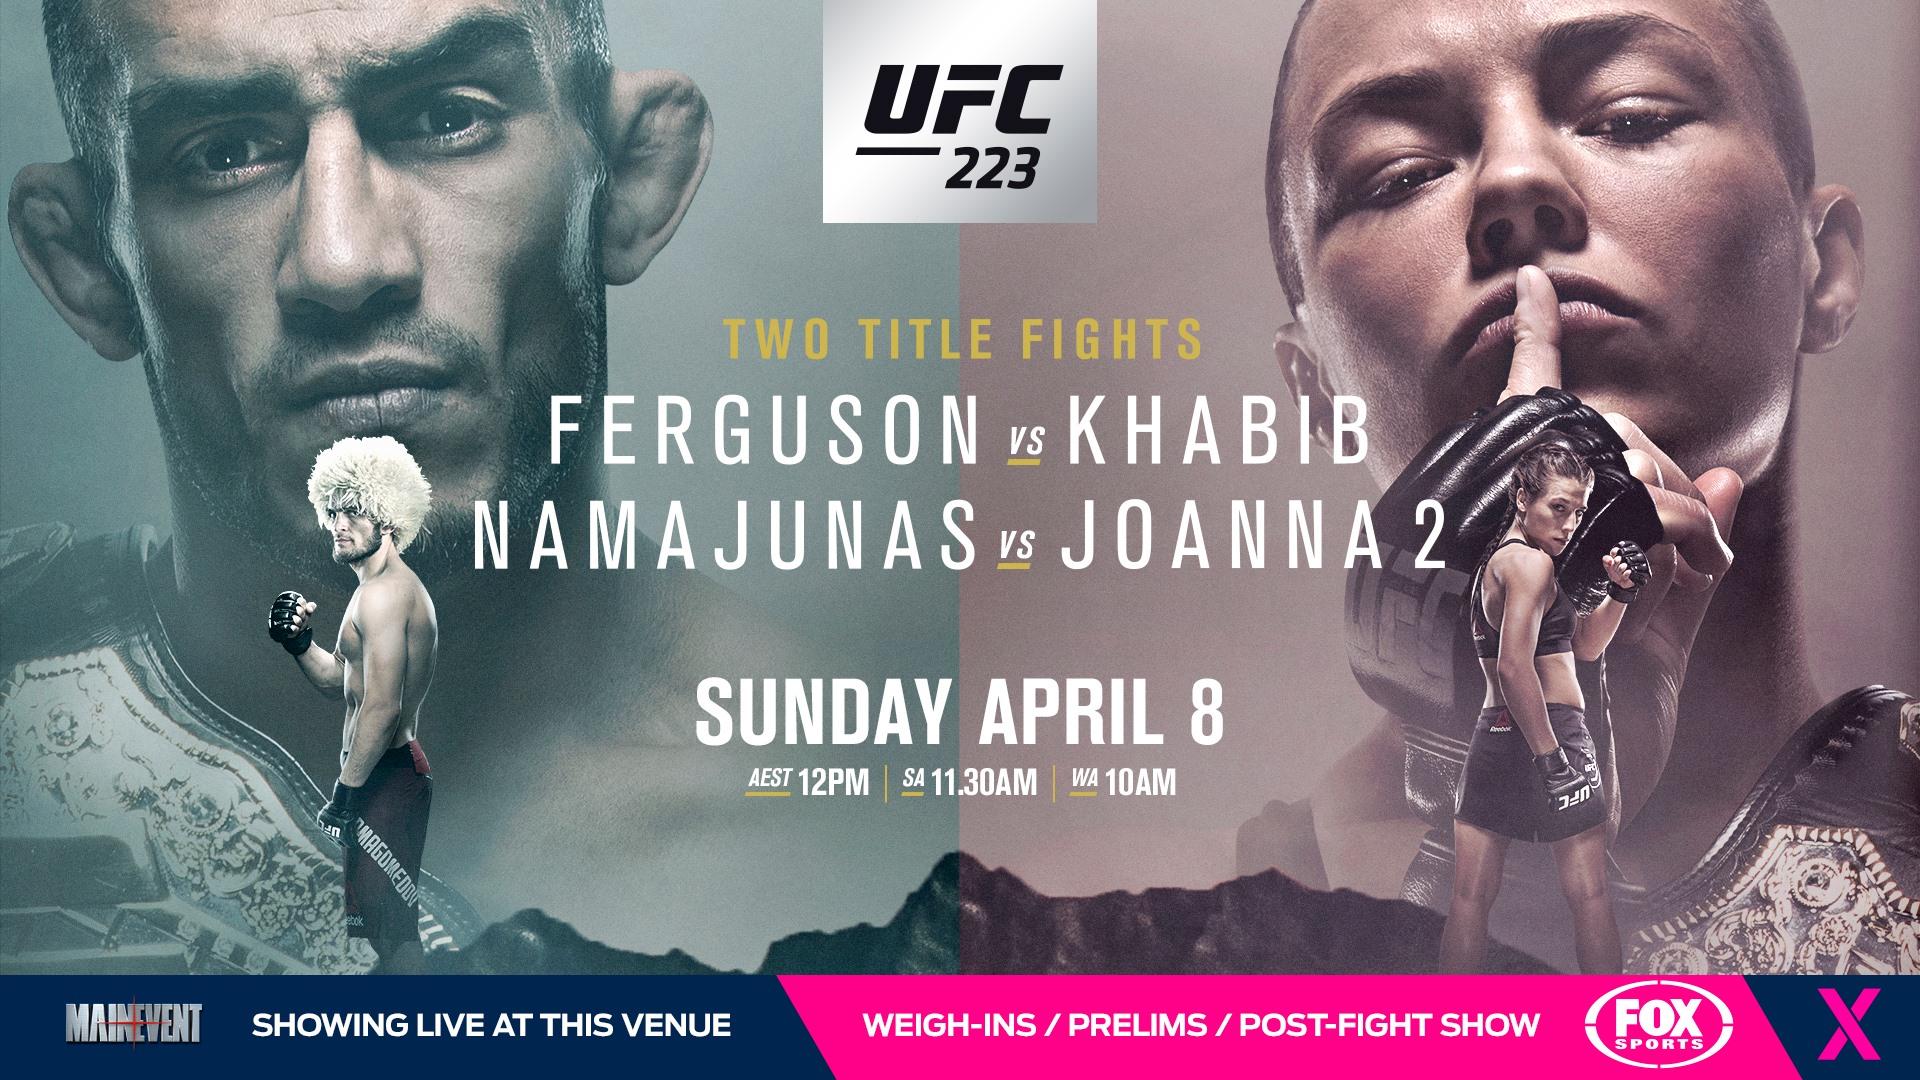 UFC 223 Ferguson vs Khabib   The Phoenix Hotel 1920x1080